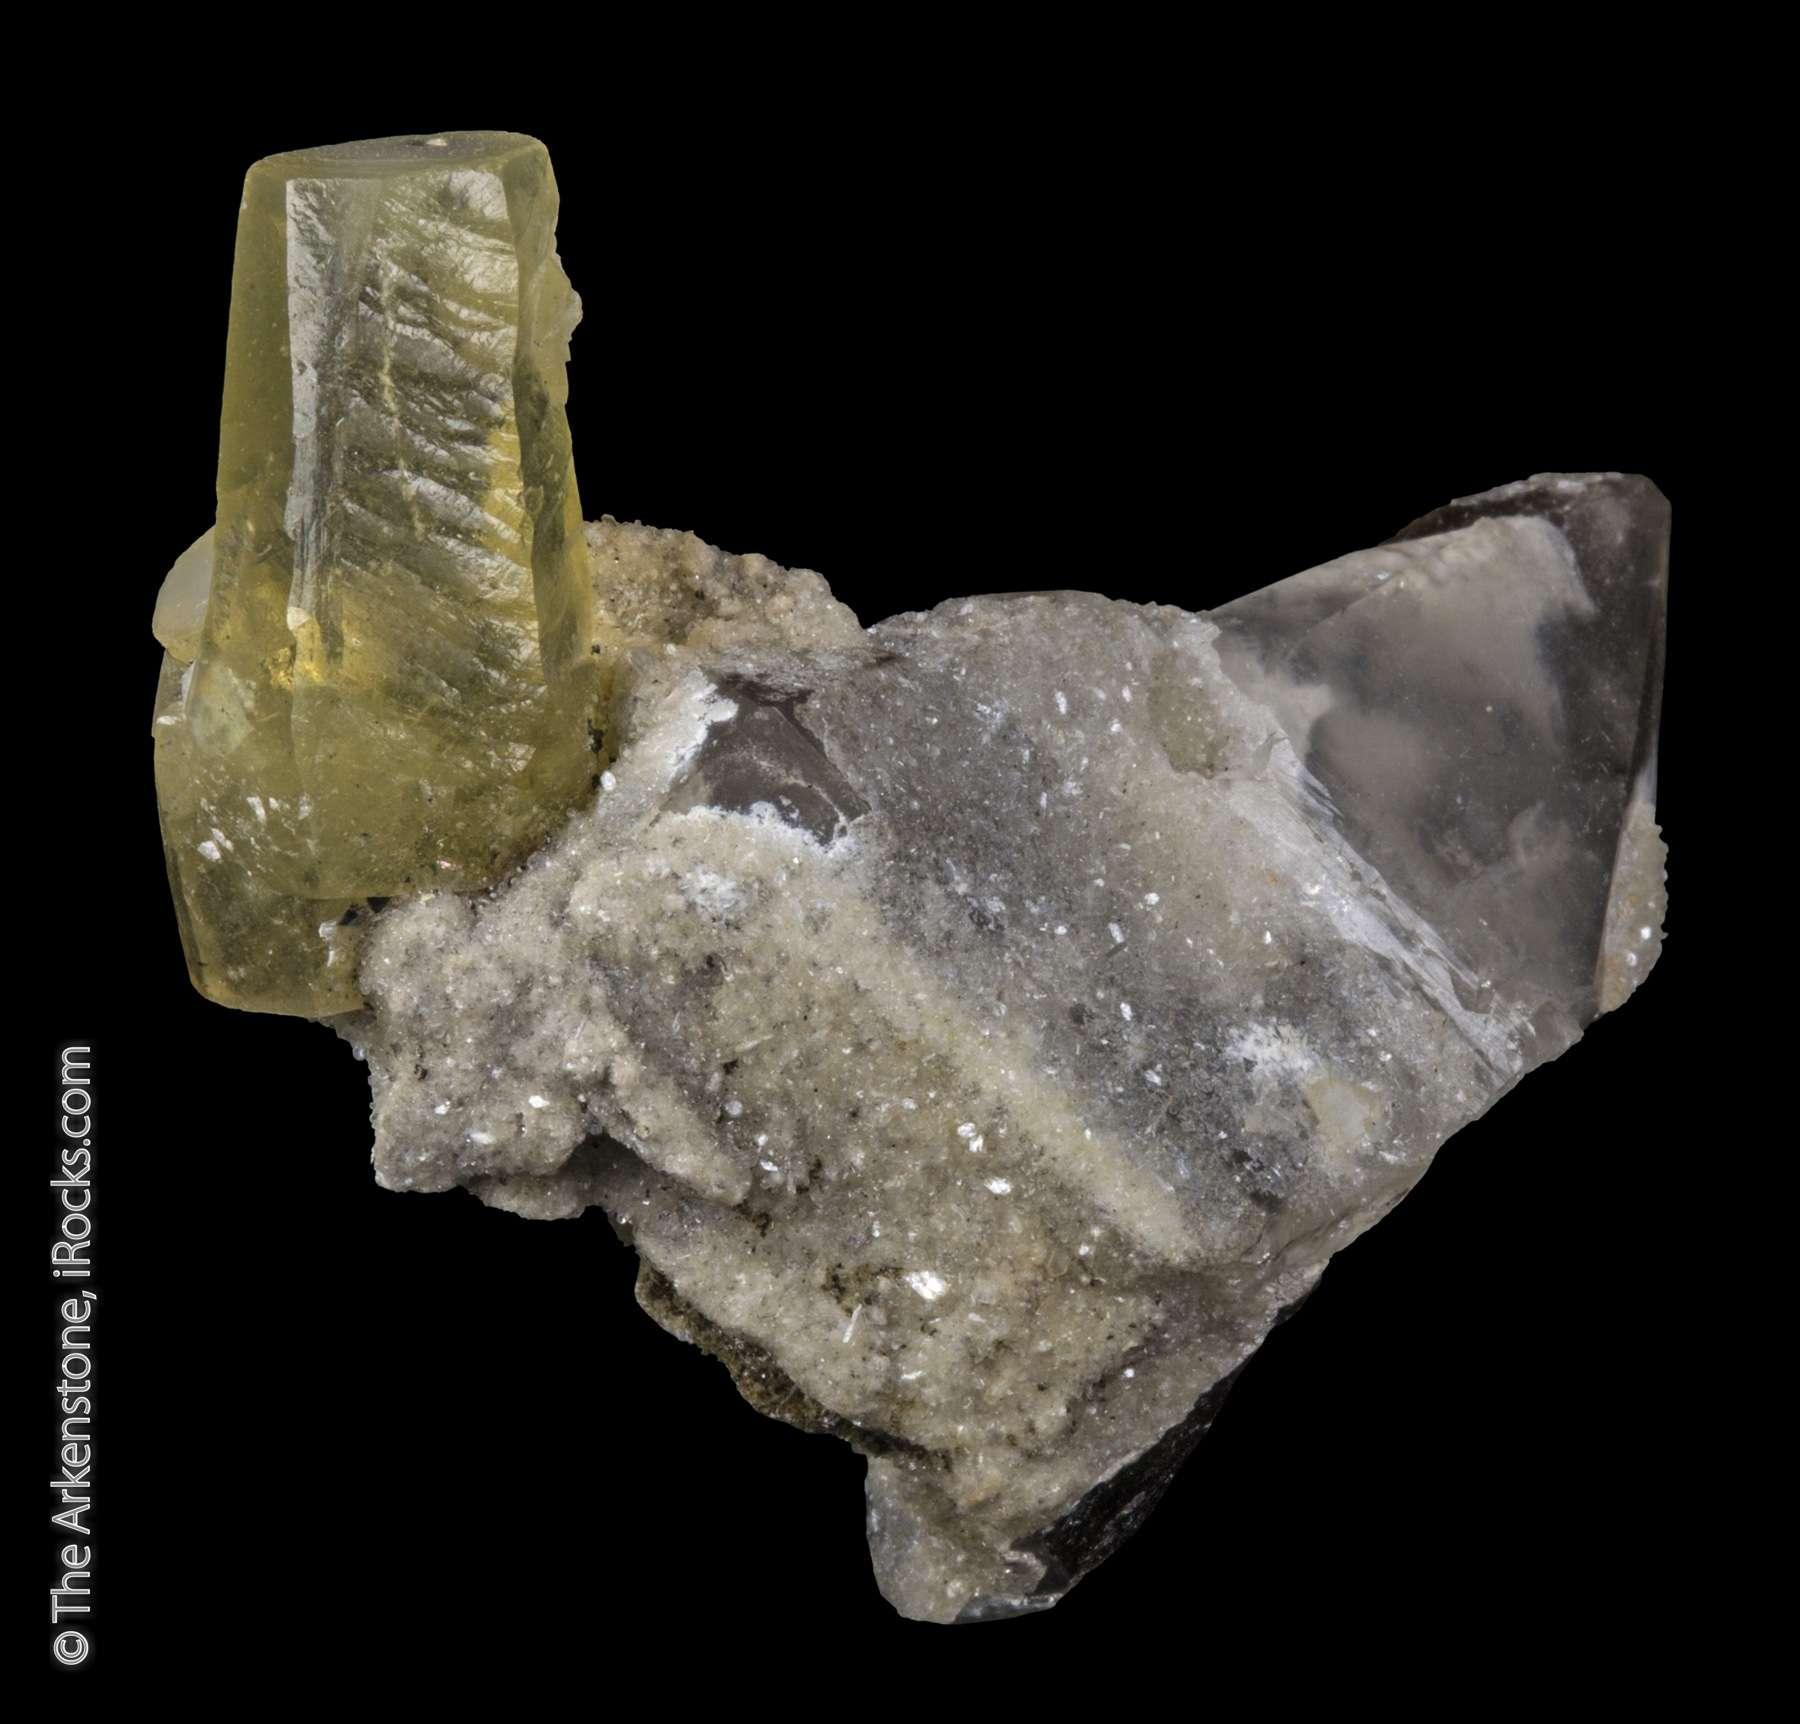 Smoky quartz hint pink elbaite albite form matrix doubly terminated